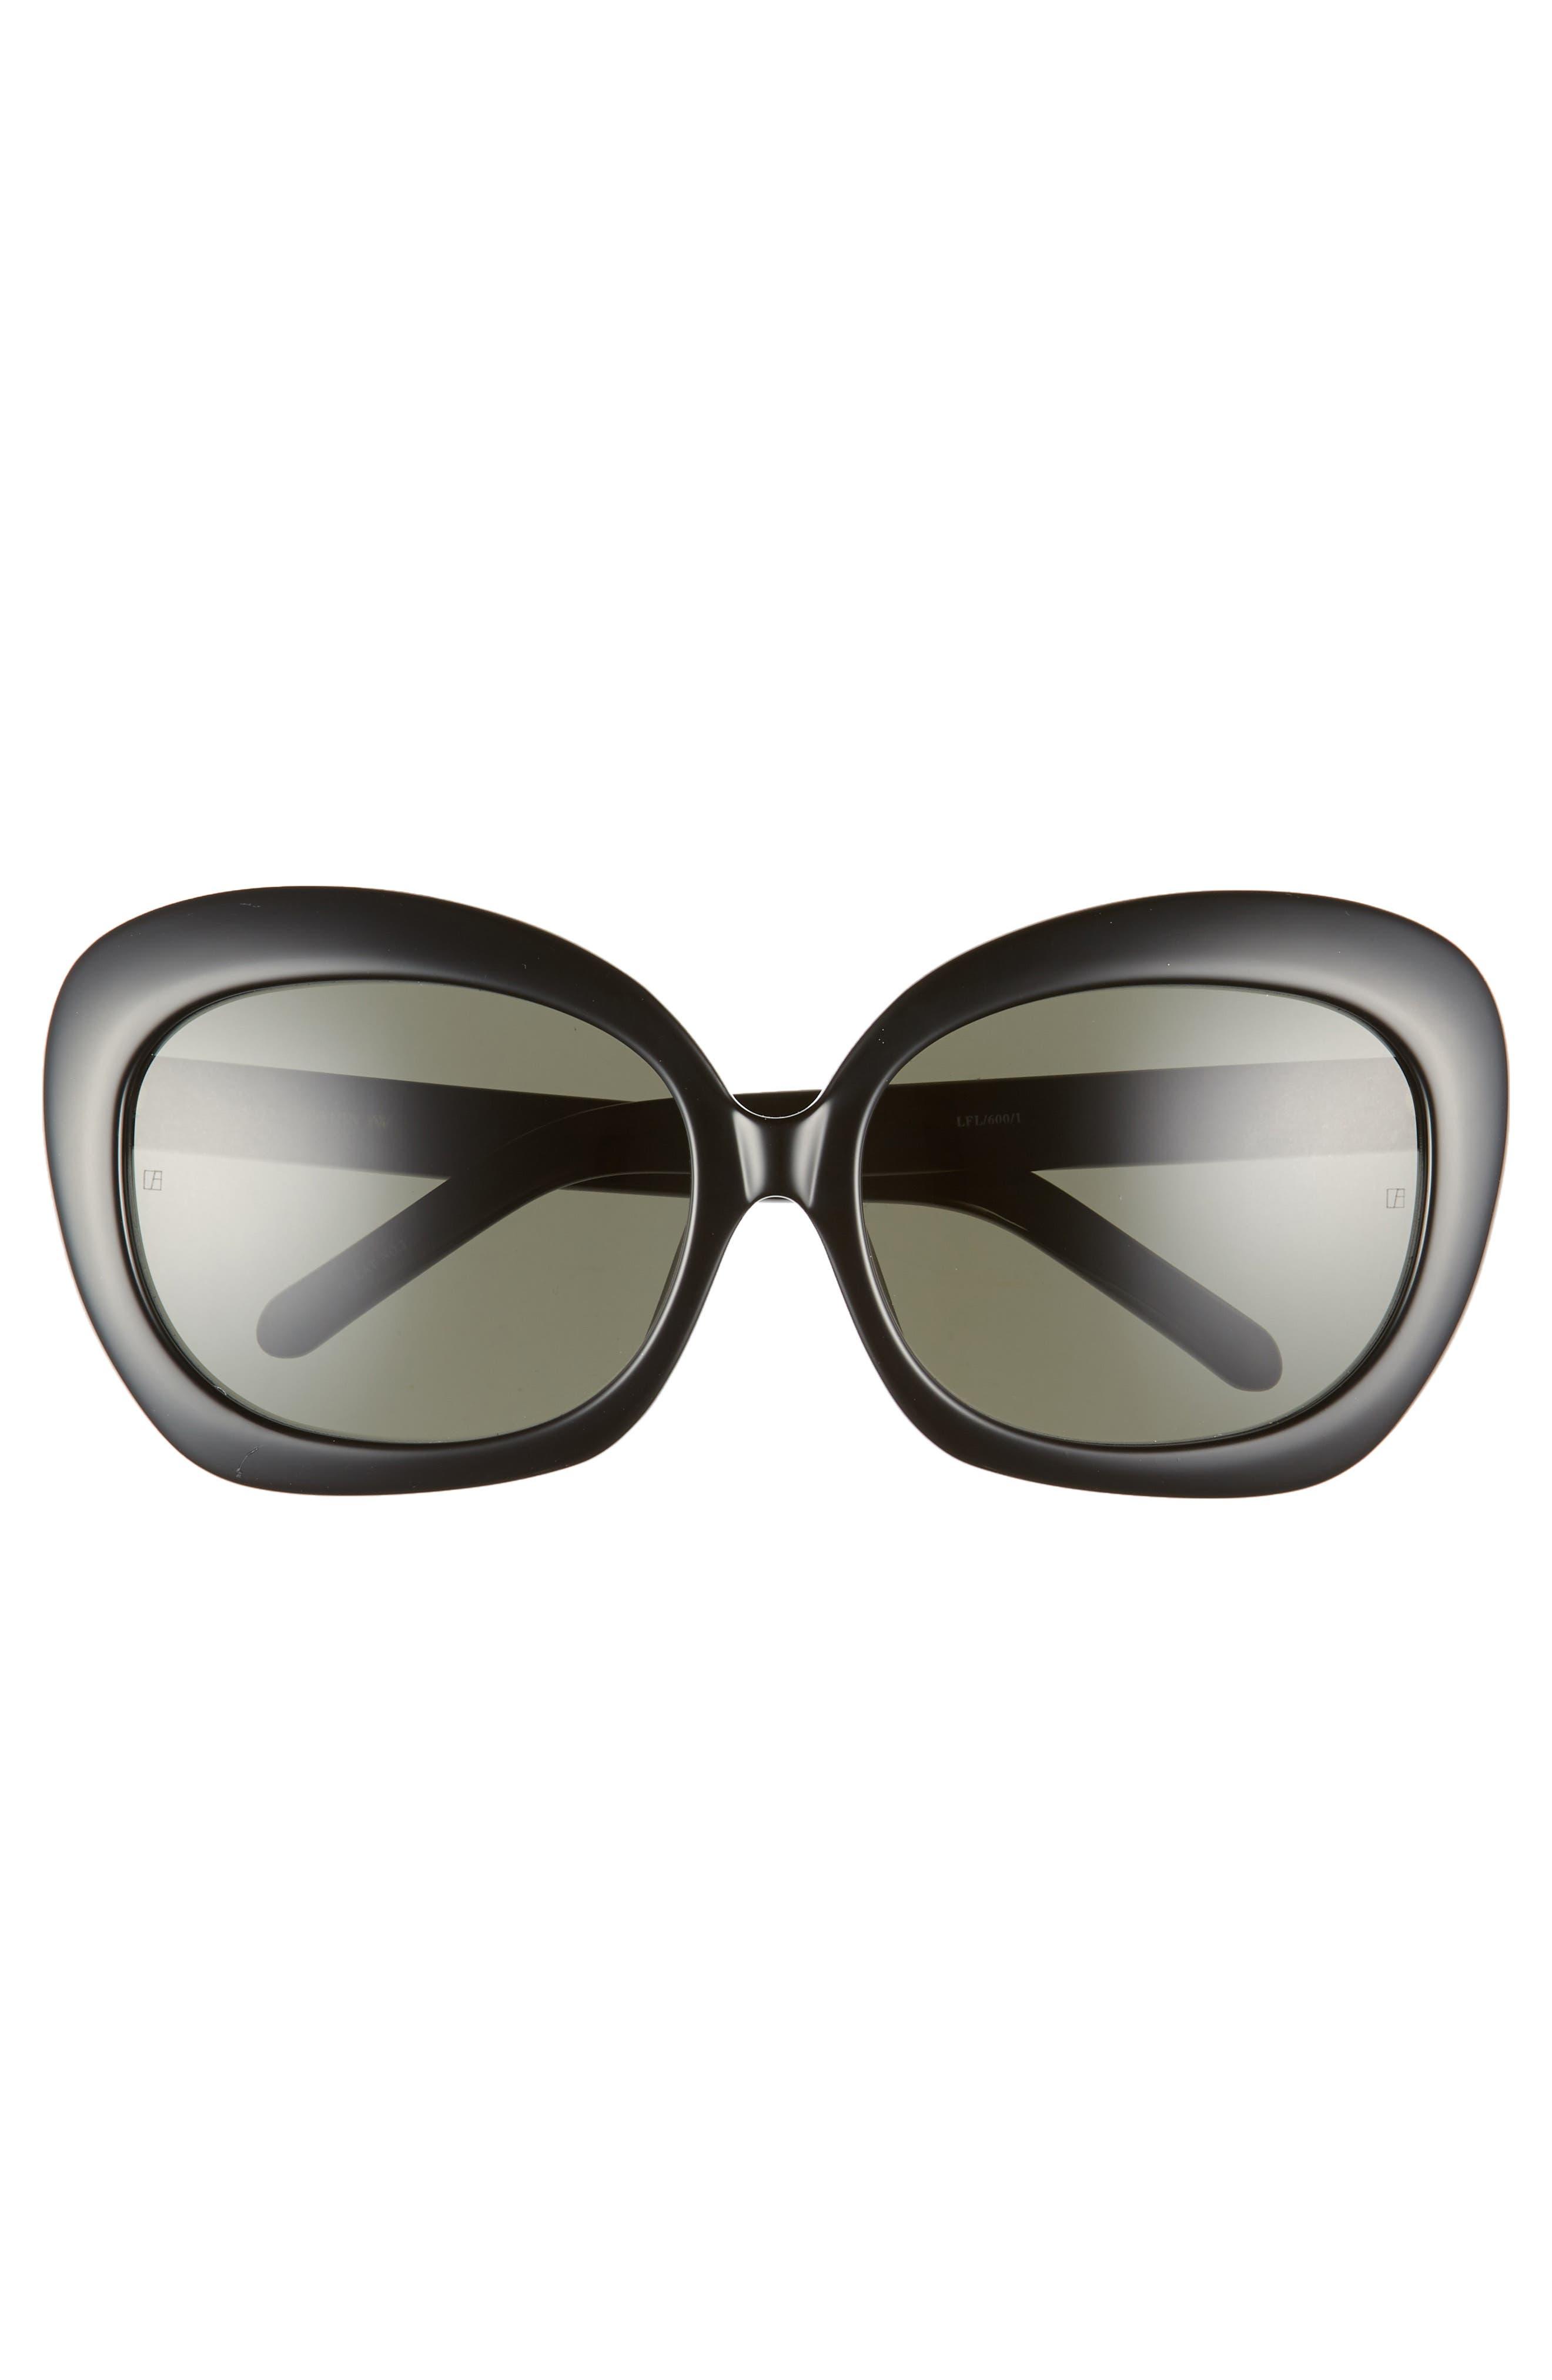 LINDA FARROW,                             62mm Oversize Round Sunglasses,                             Alternate thumbnail 3, color,                             BLACK